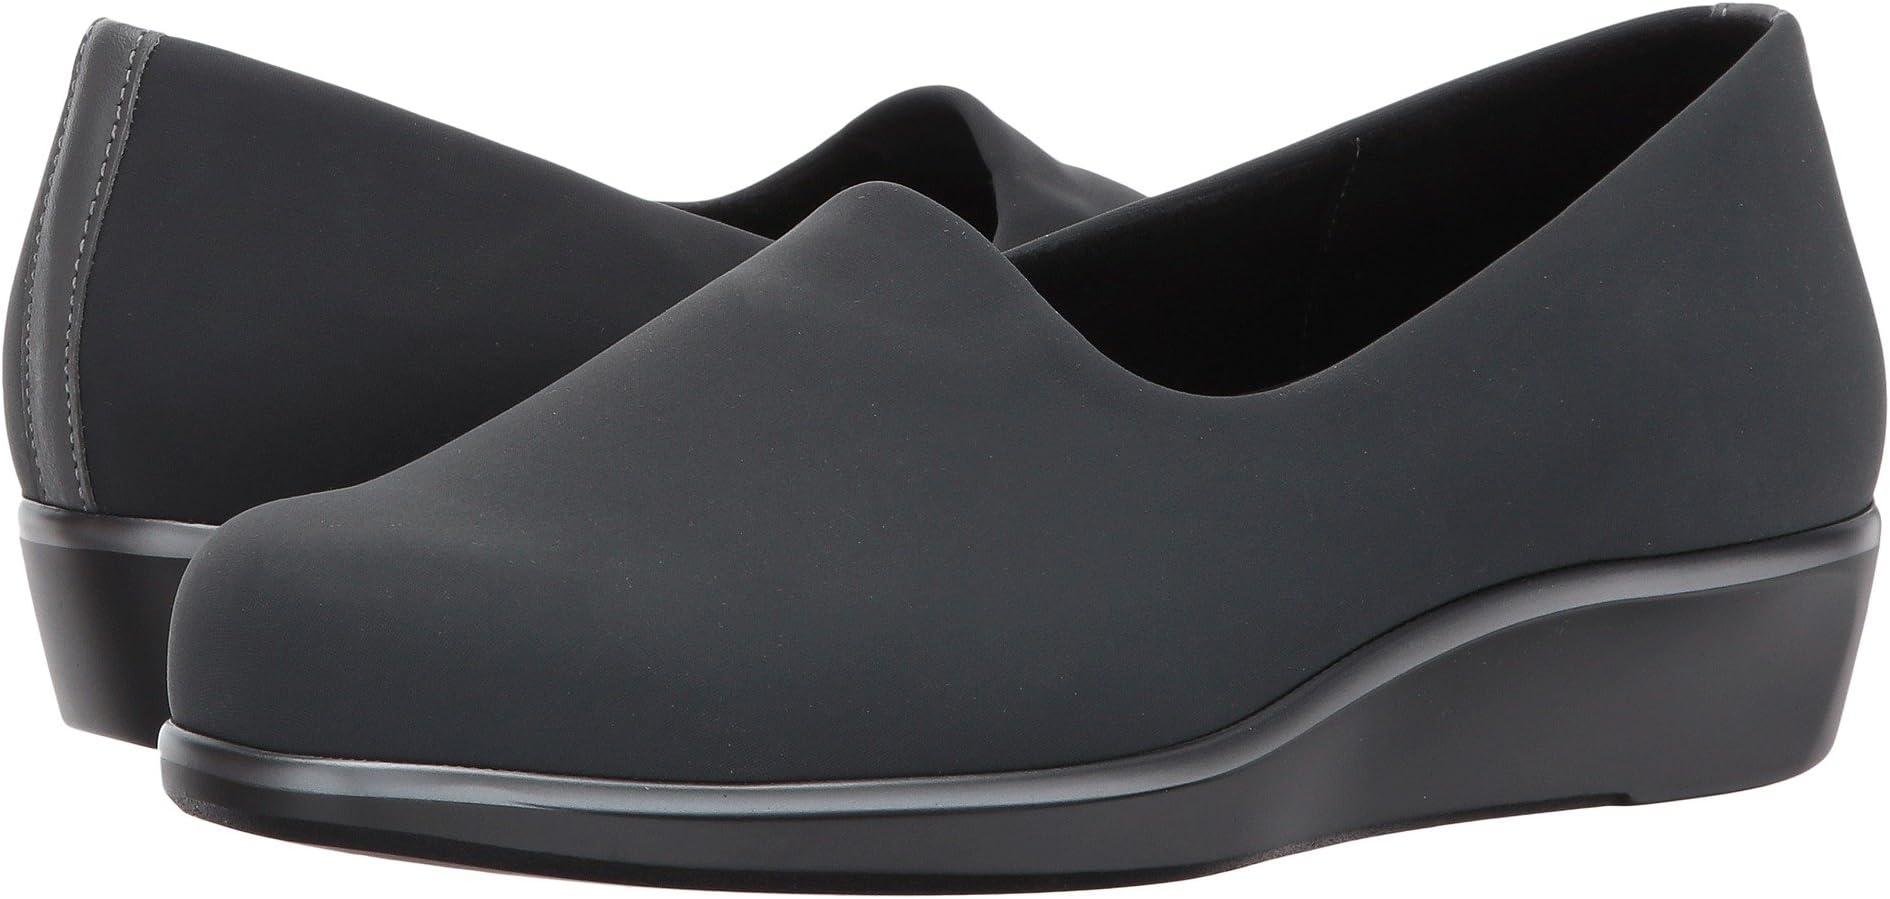 TC-5-SAS-Loafers-2019-10-15